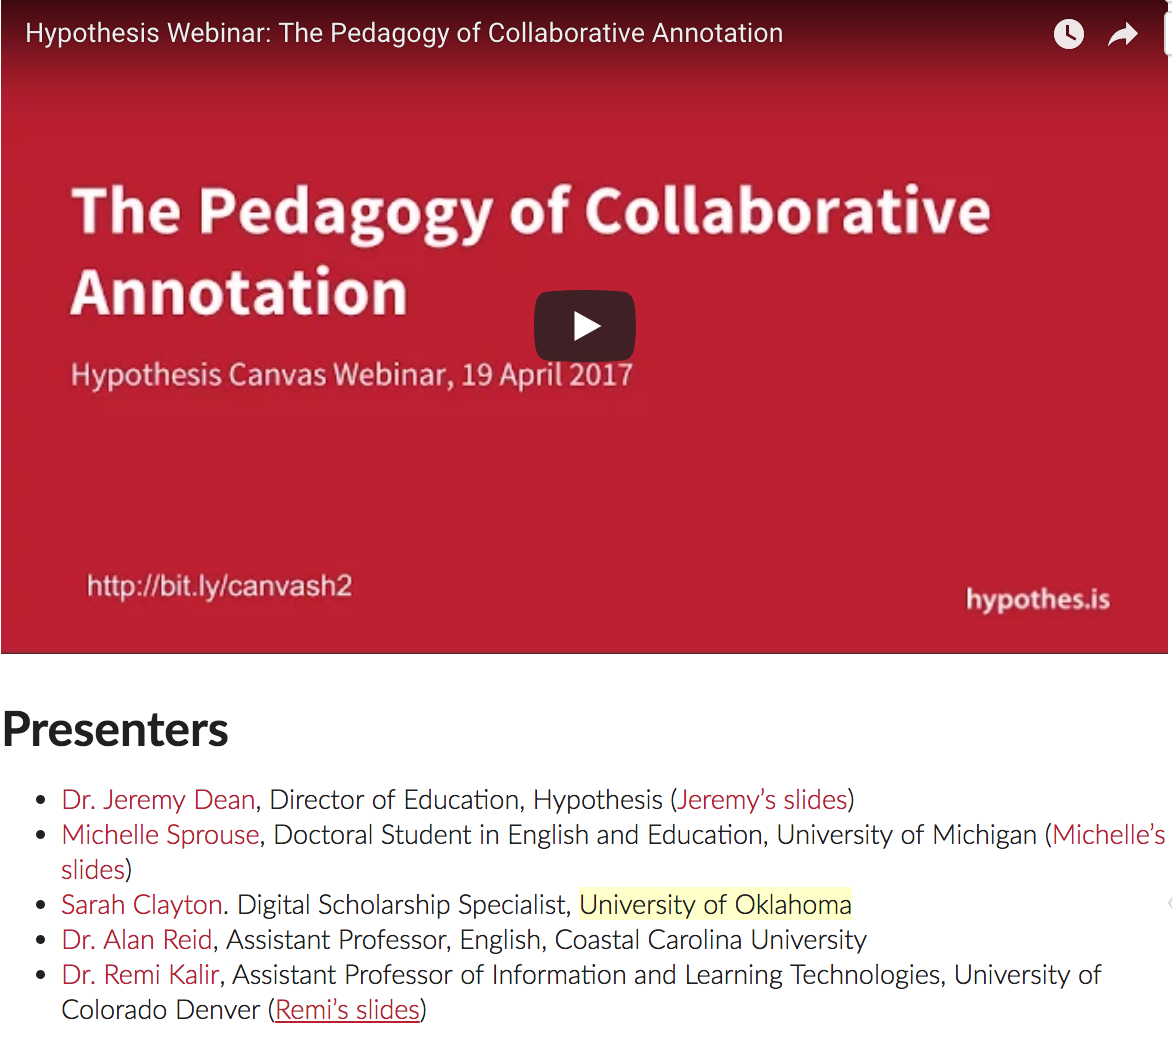 The pedagogy of collaborative annotation | Hypothesis Webinar